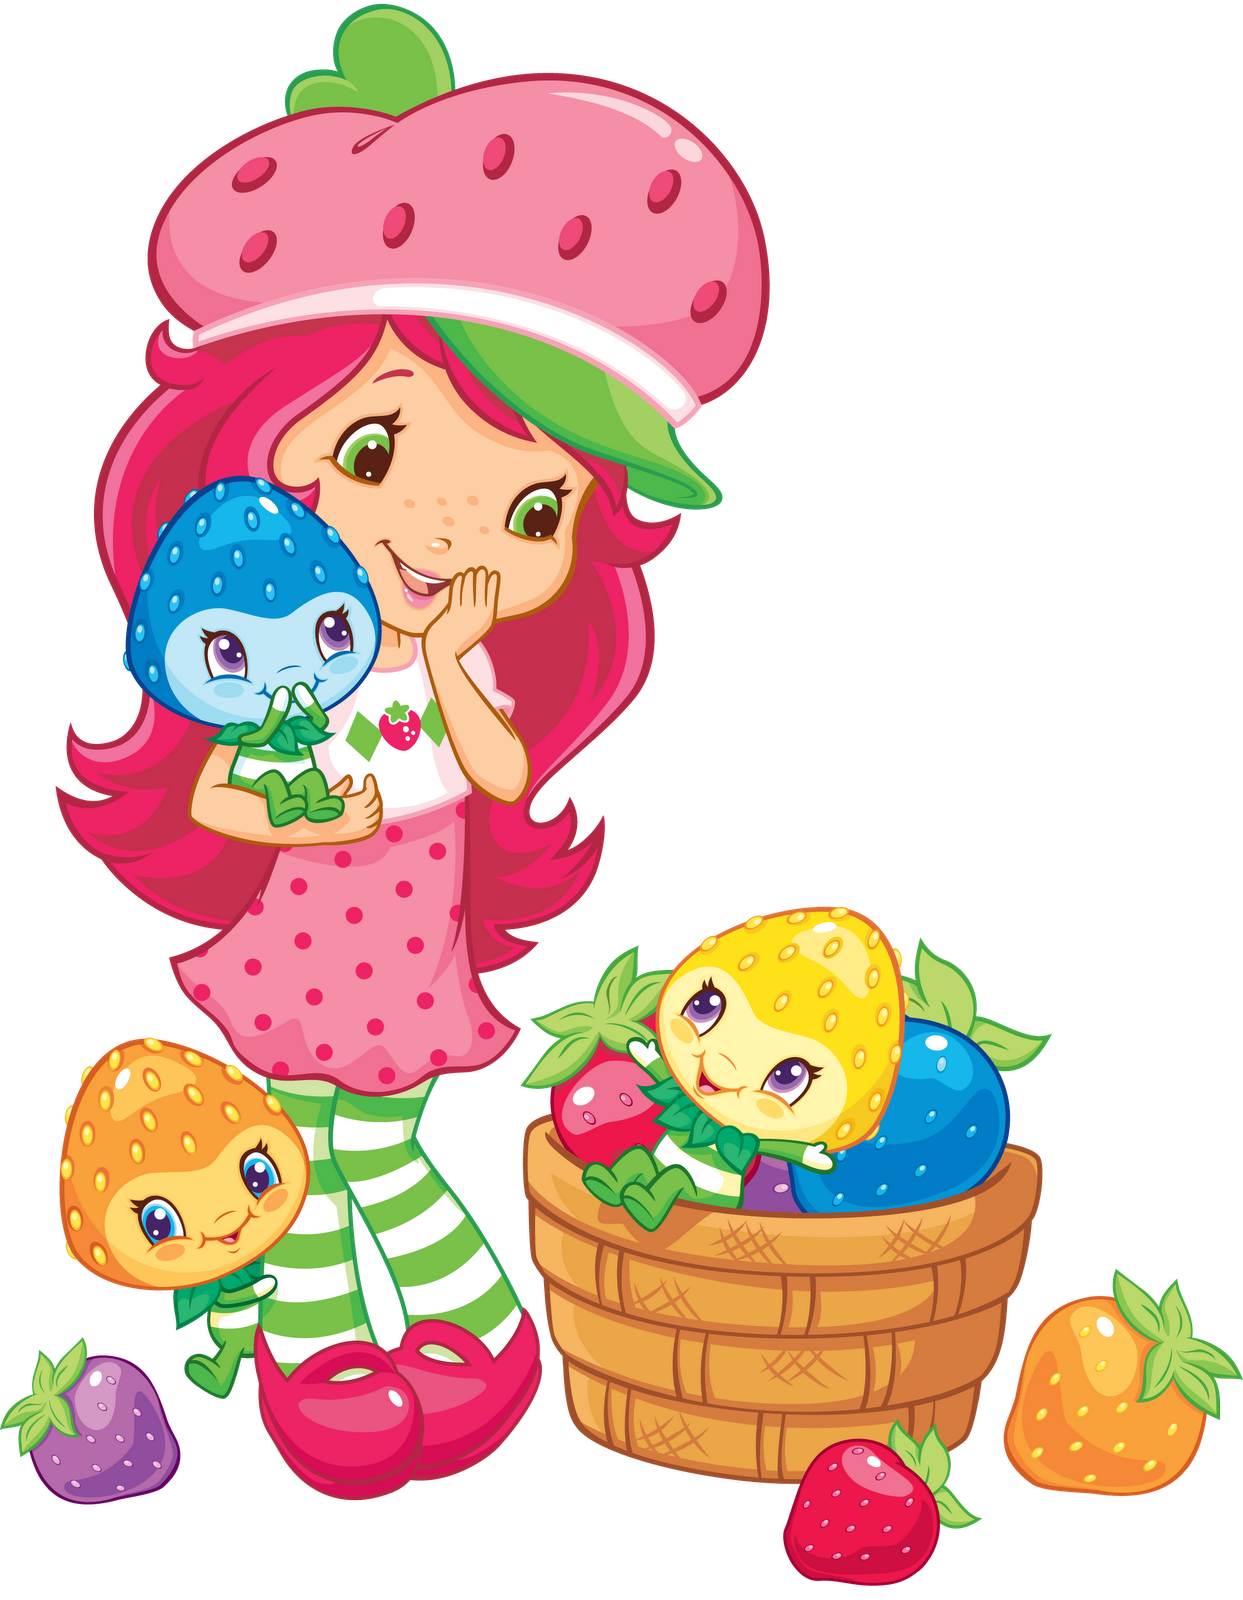 Strawberry Shortcake musica para hacer amigos parte 1